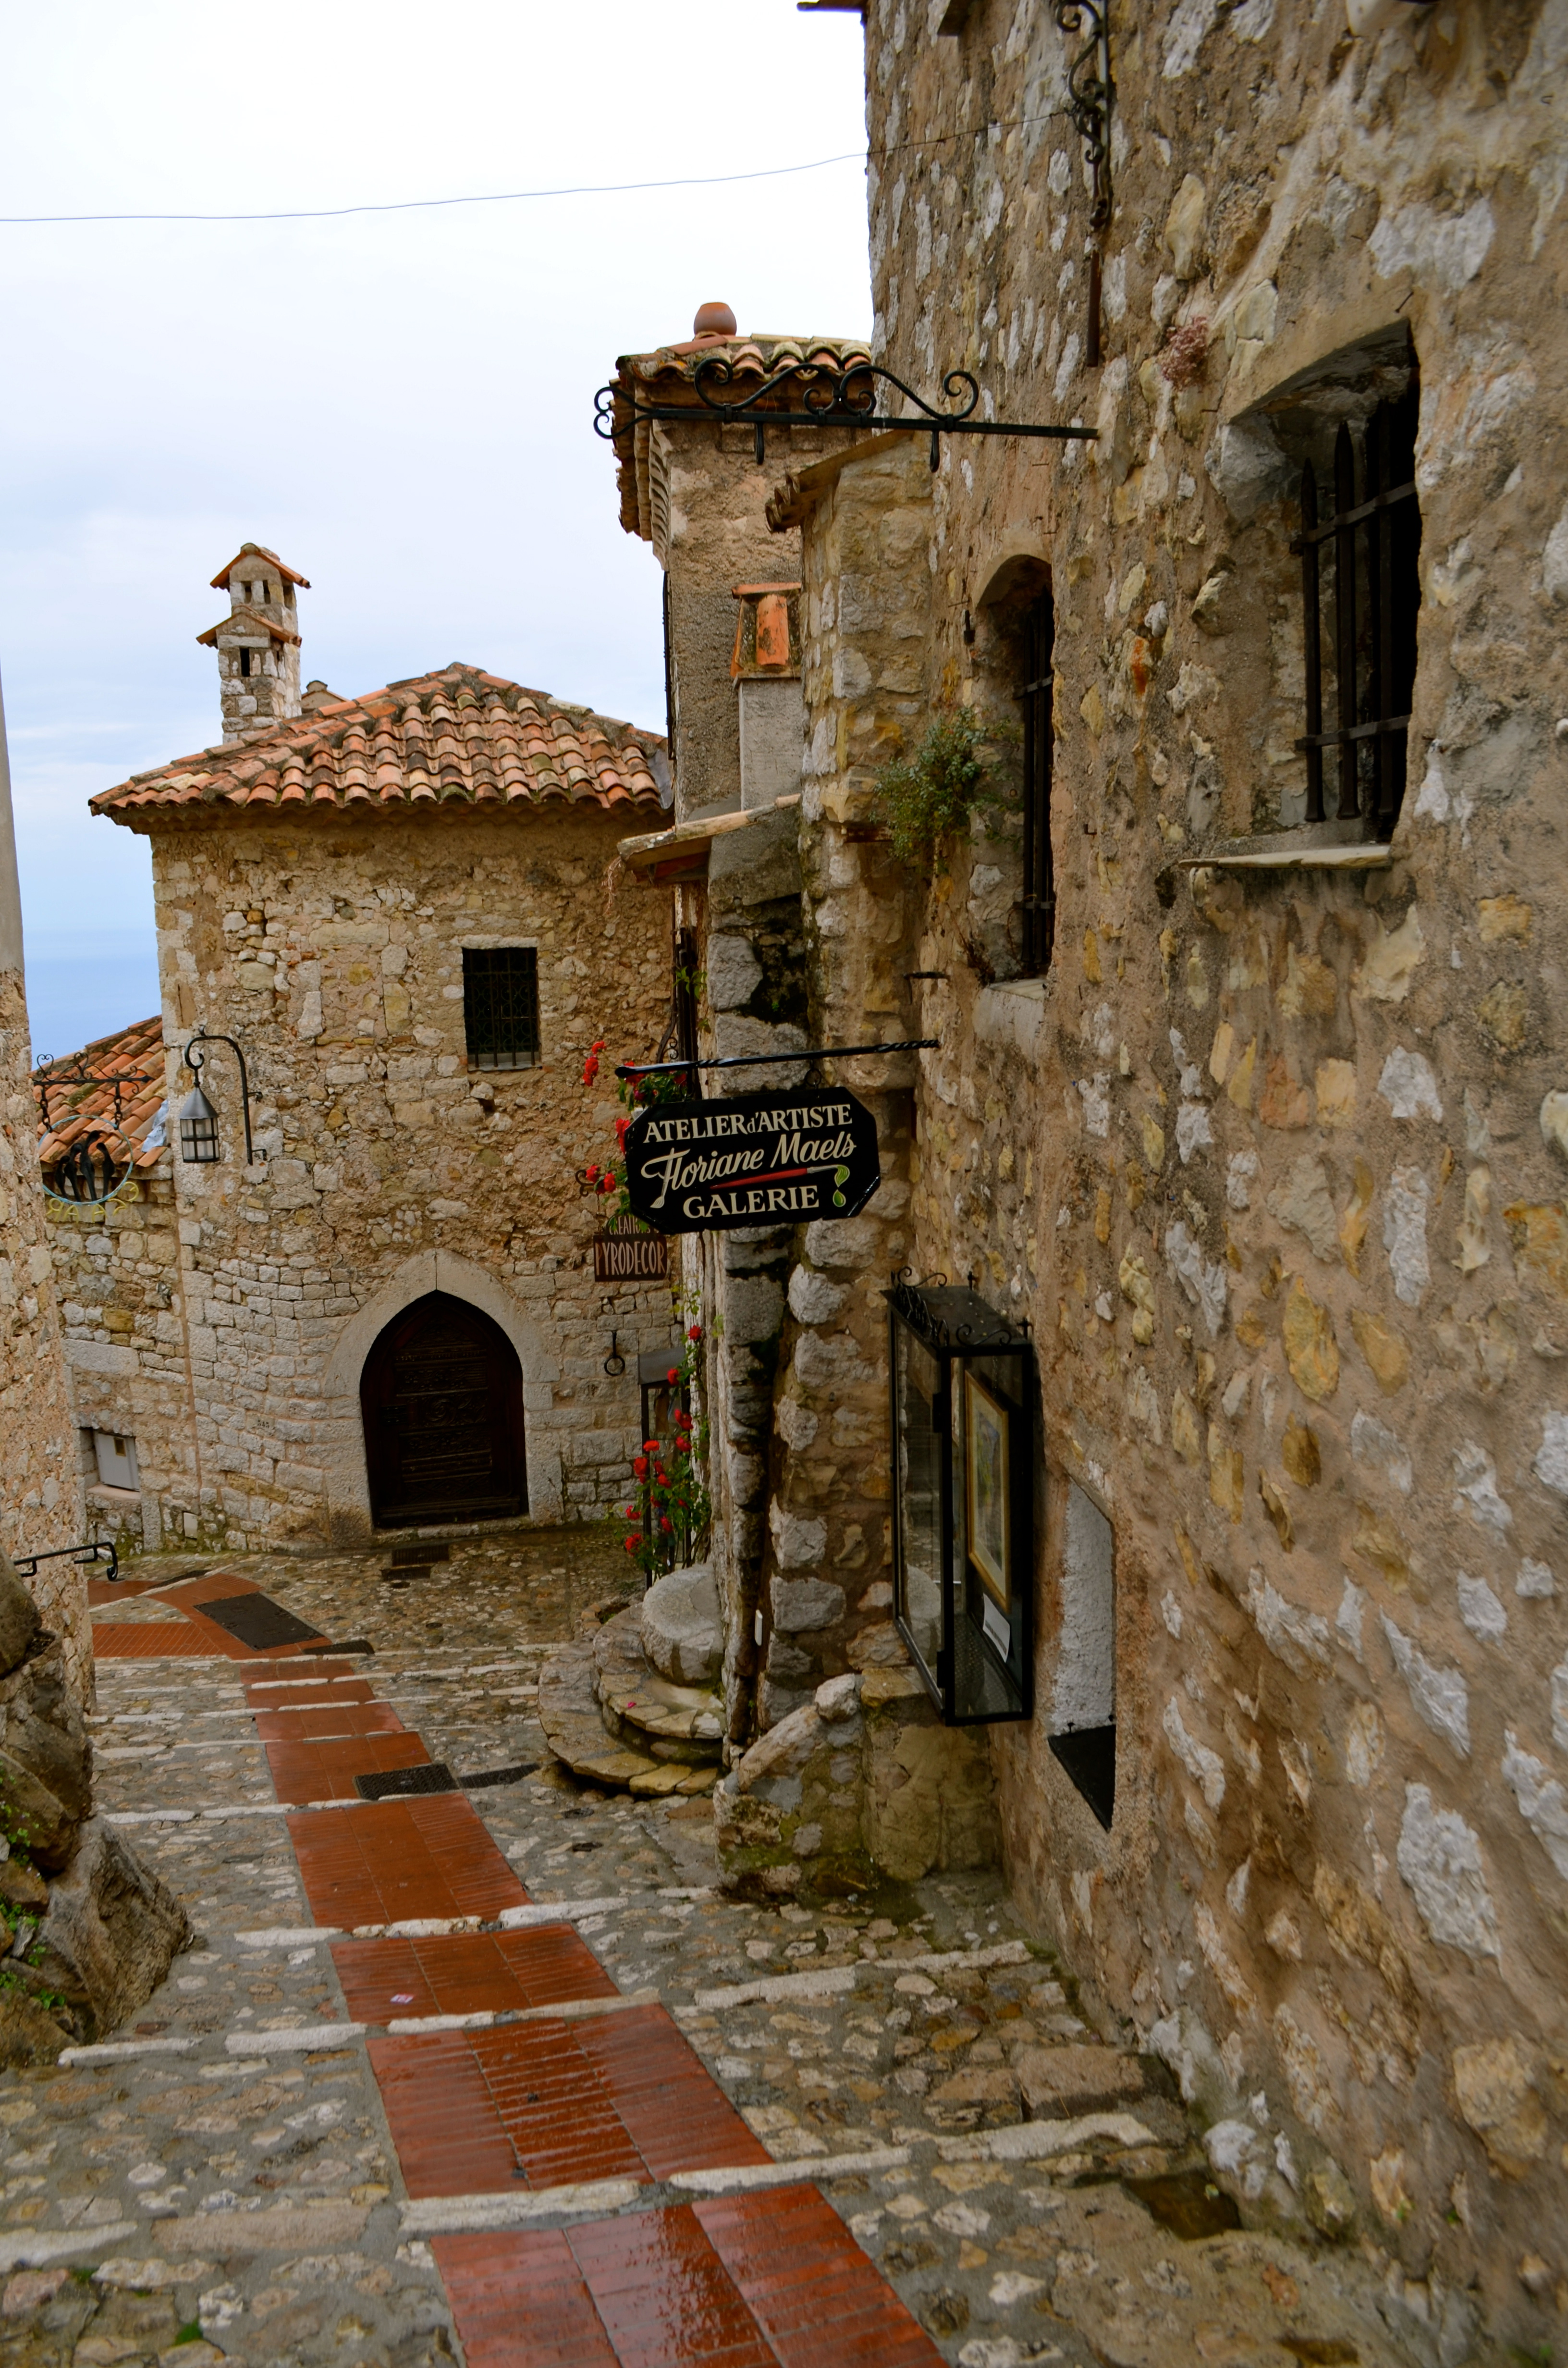 Take It Eze Y The Cote D Azur Town Of Eze